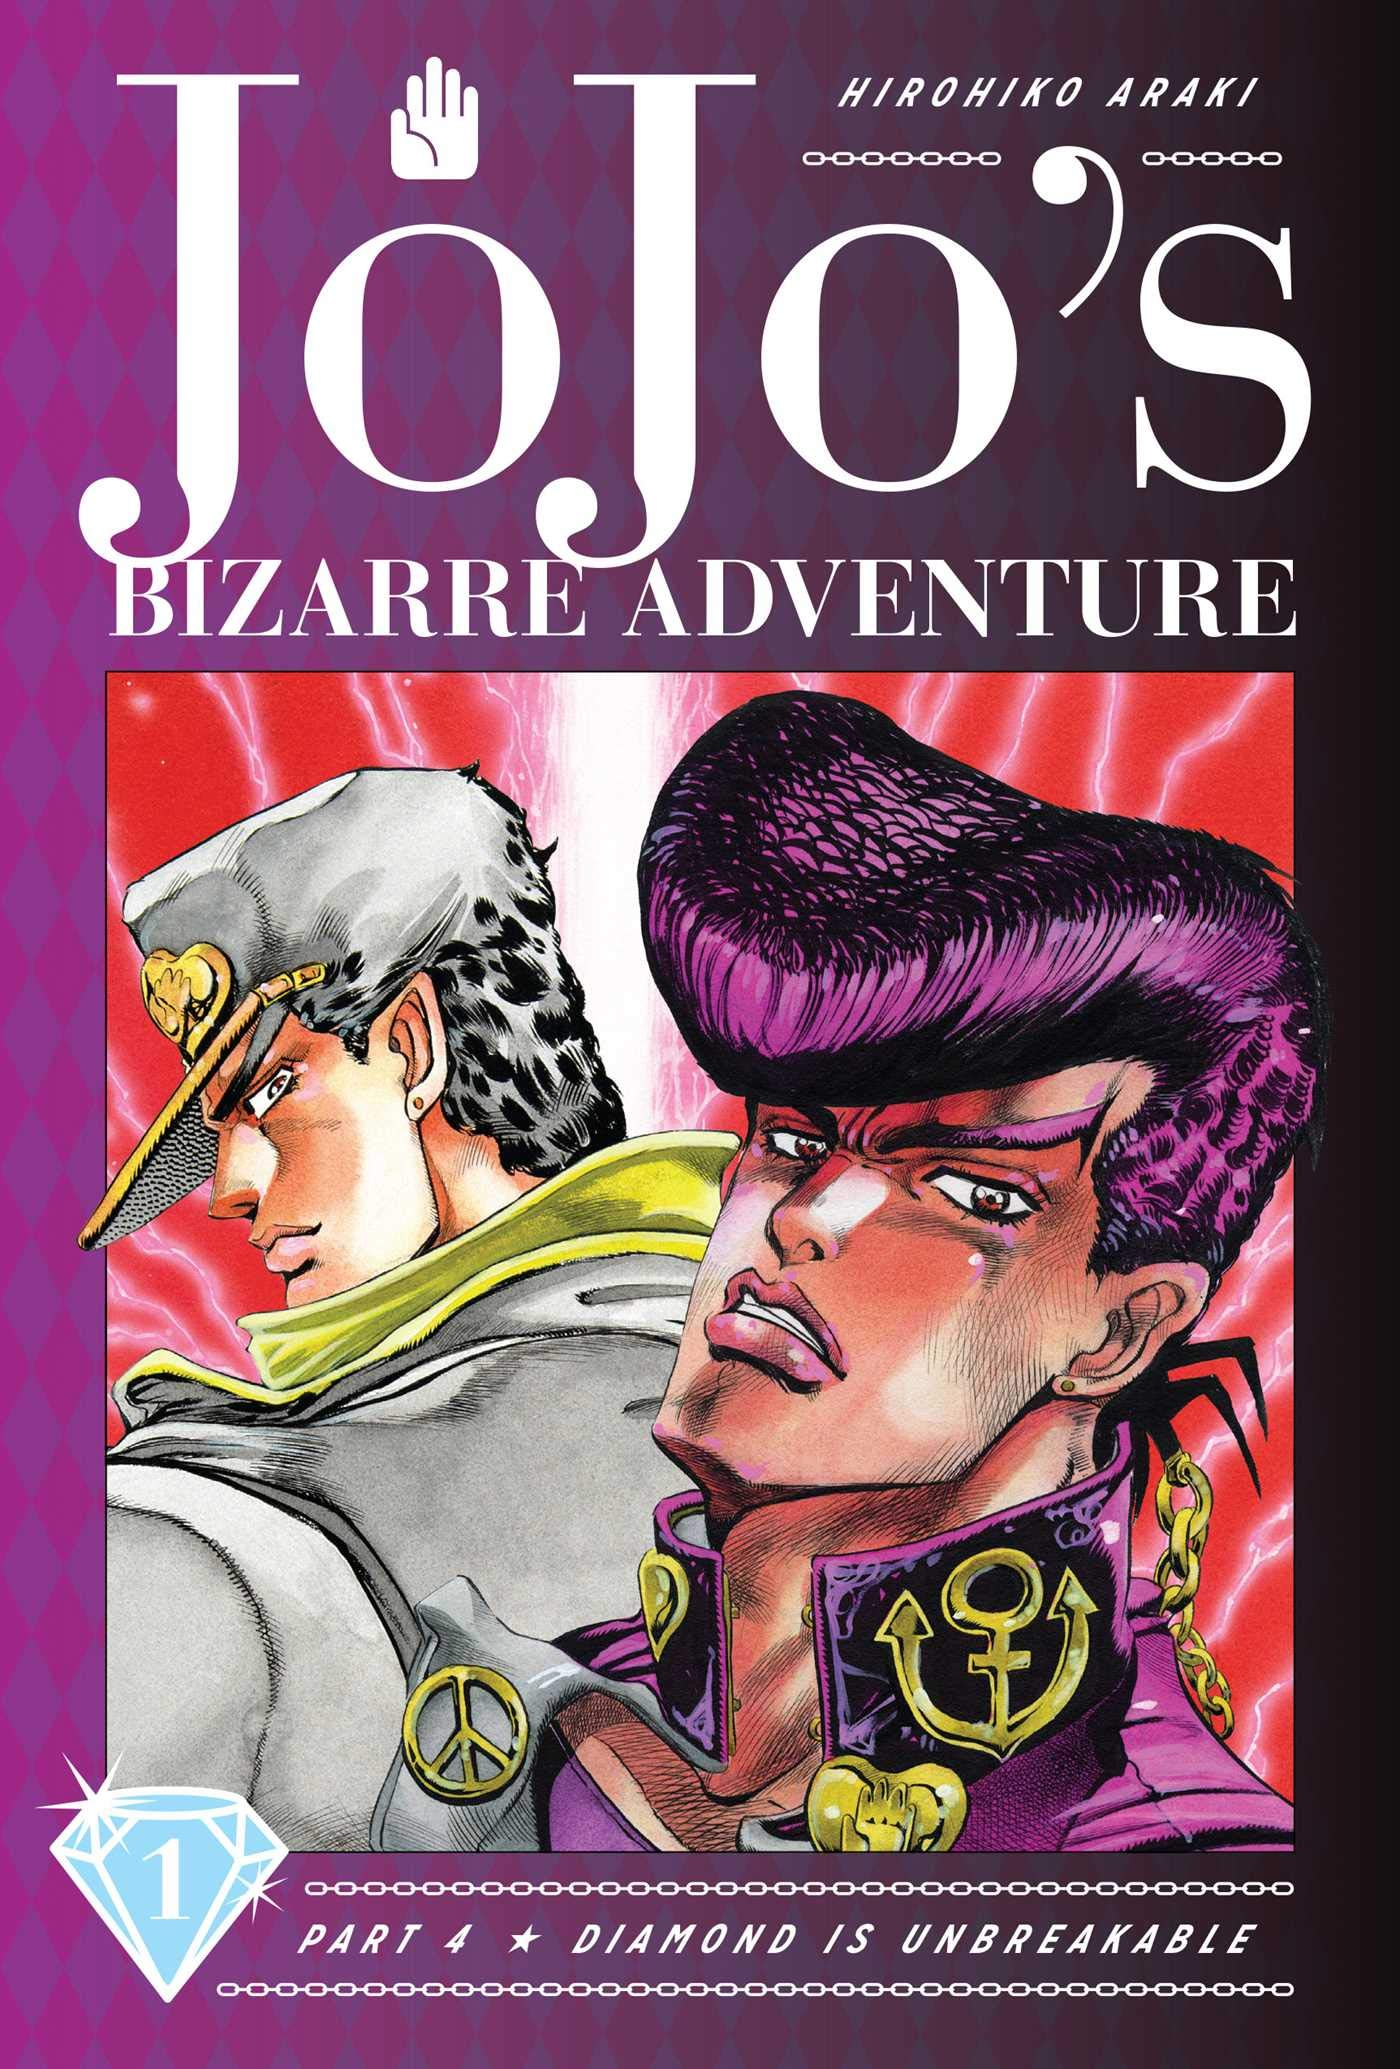 JoJo's Bizarre Adventure: Part 4--Diamond Is Unbreakable, Vol. 1: Hirohiko  Araki: 9781974706525: Amazon.com: Books